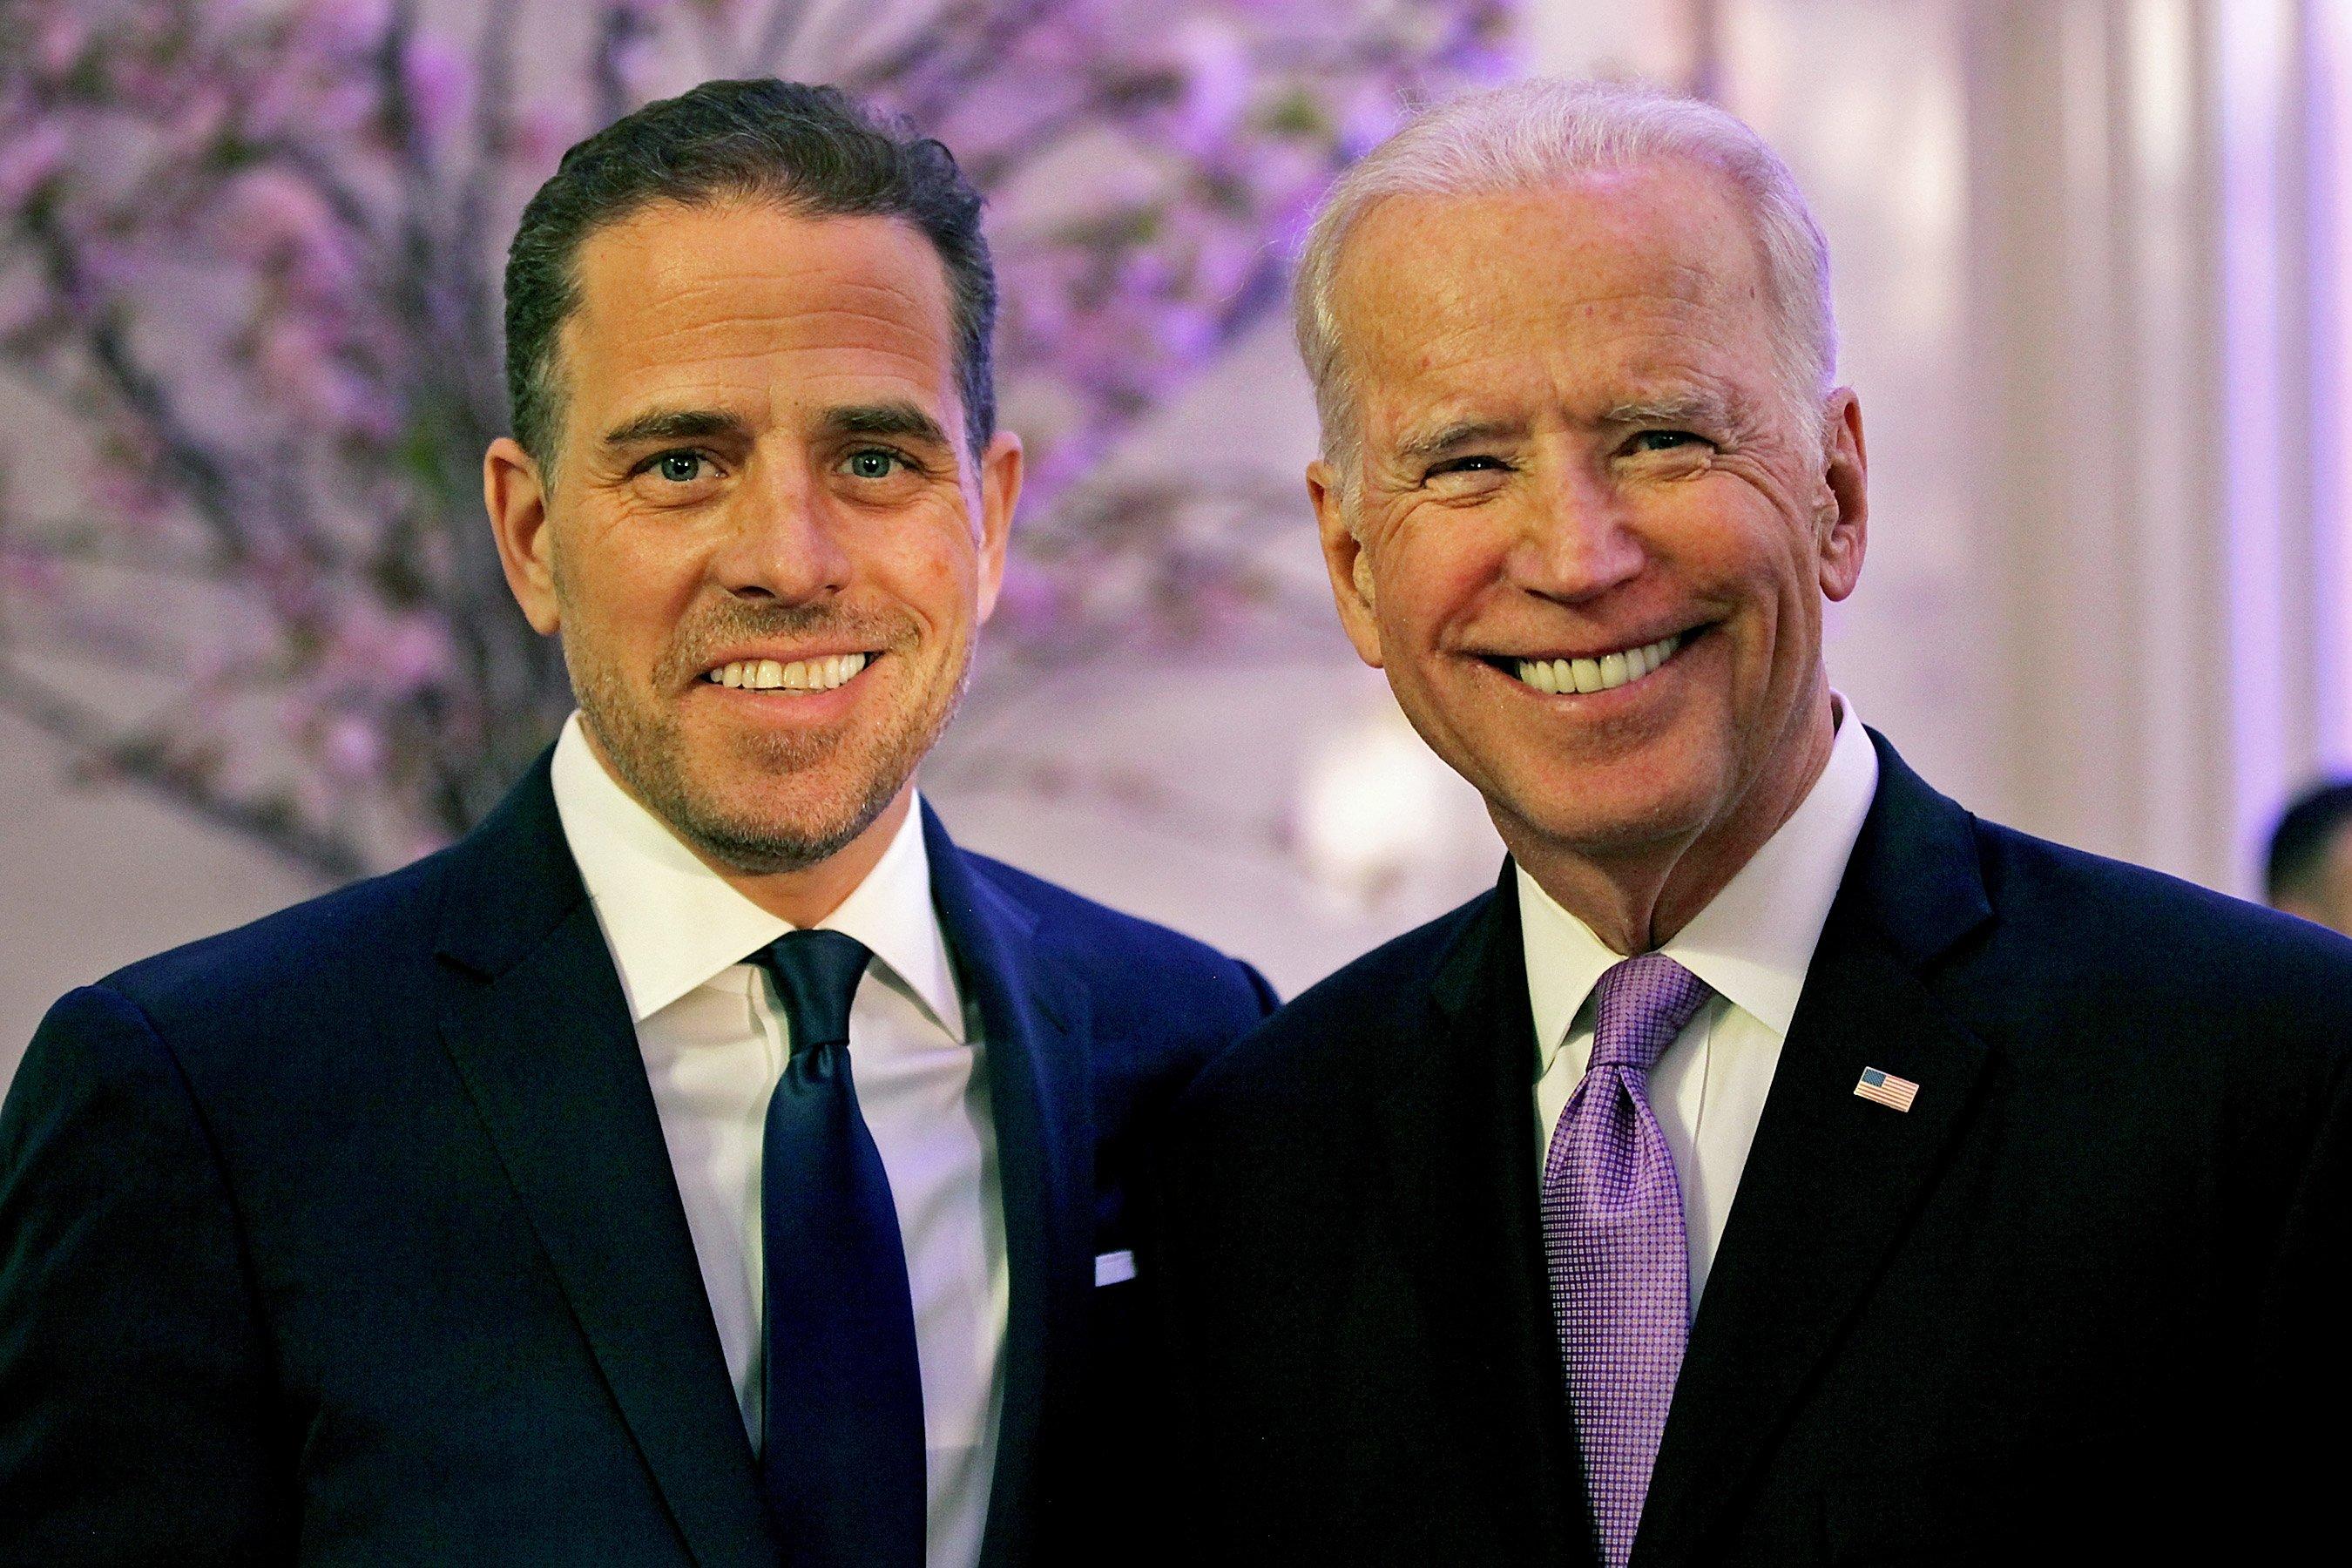 Resultado de imagen para Joe Biden e hijo